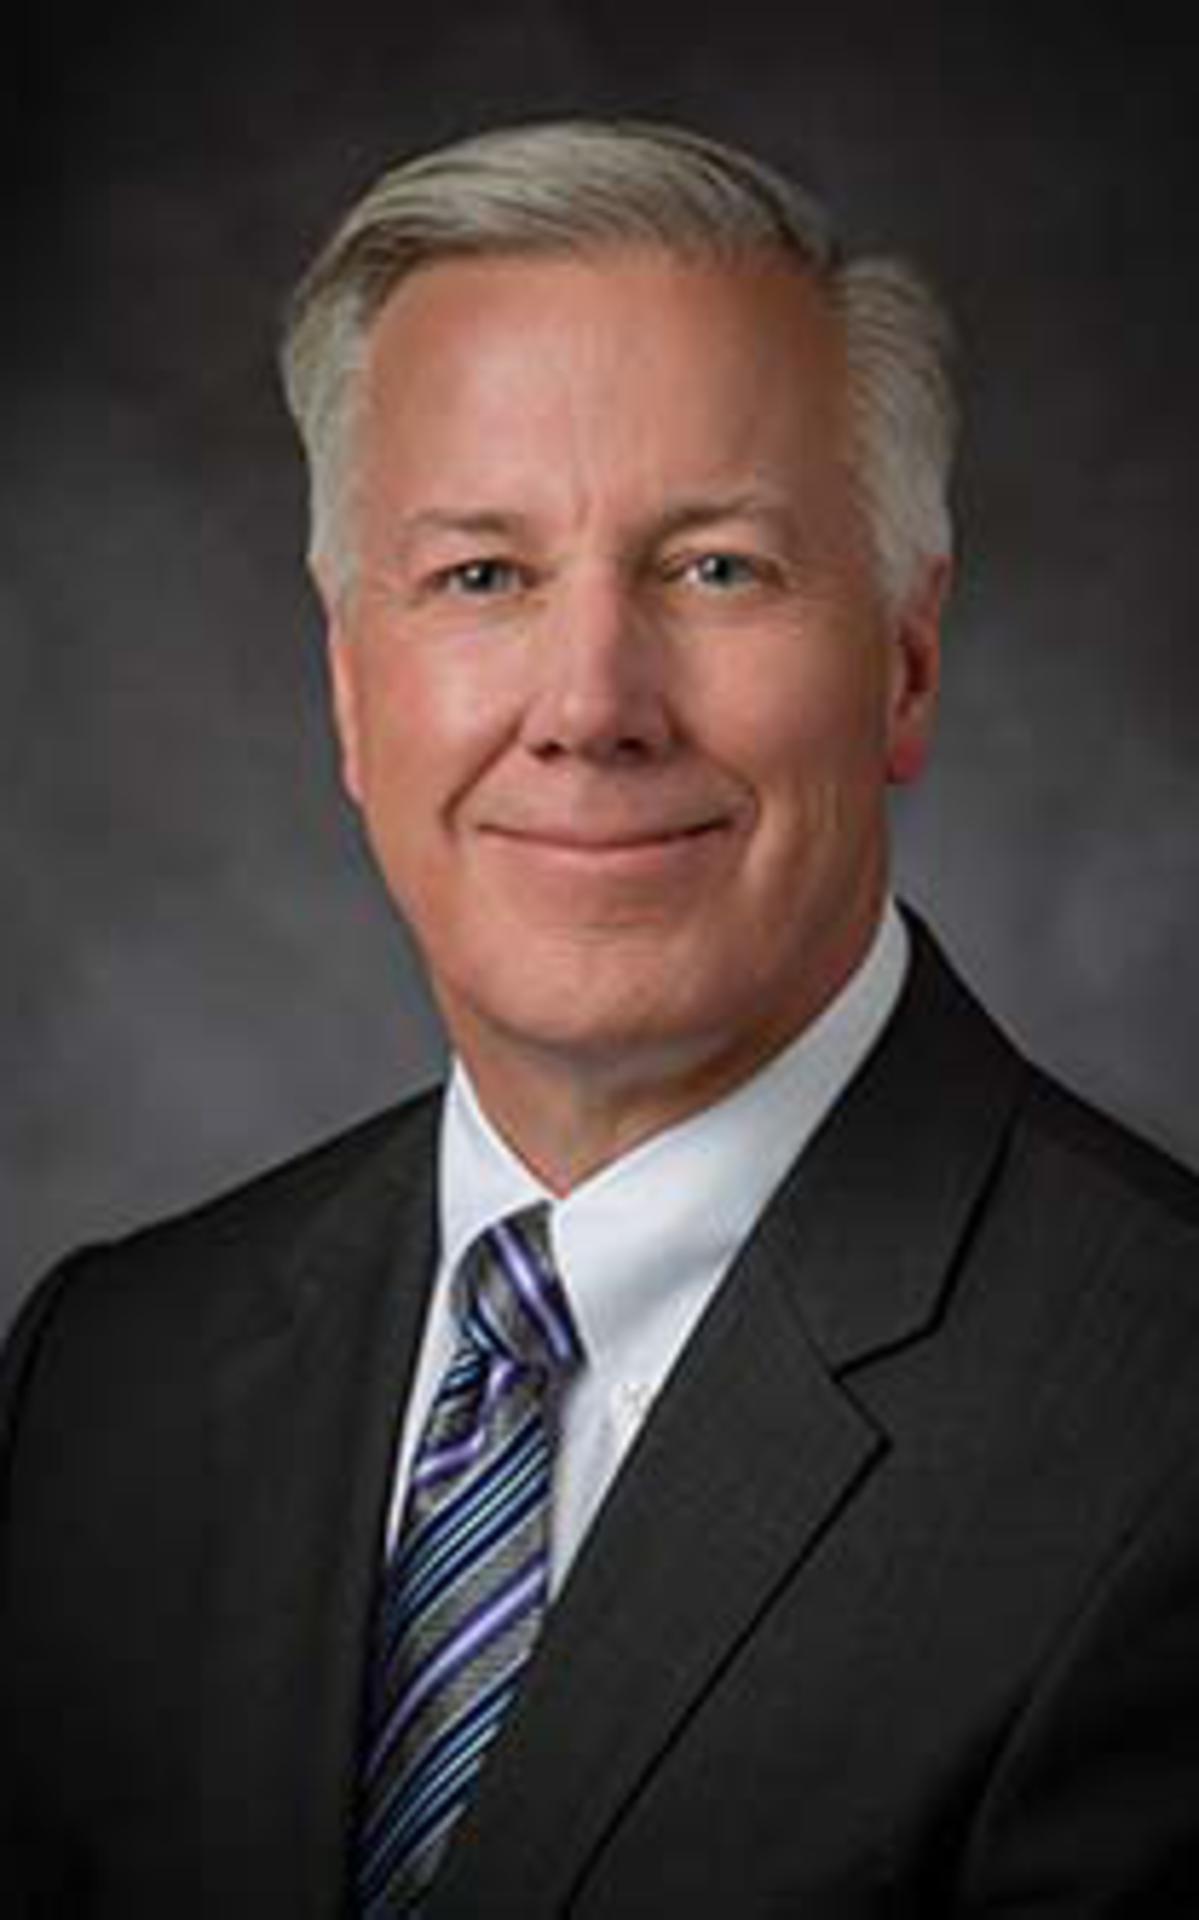 image of Elder Kevin S. Hamilton